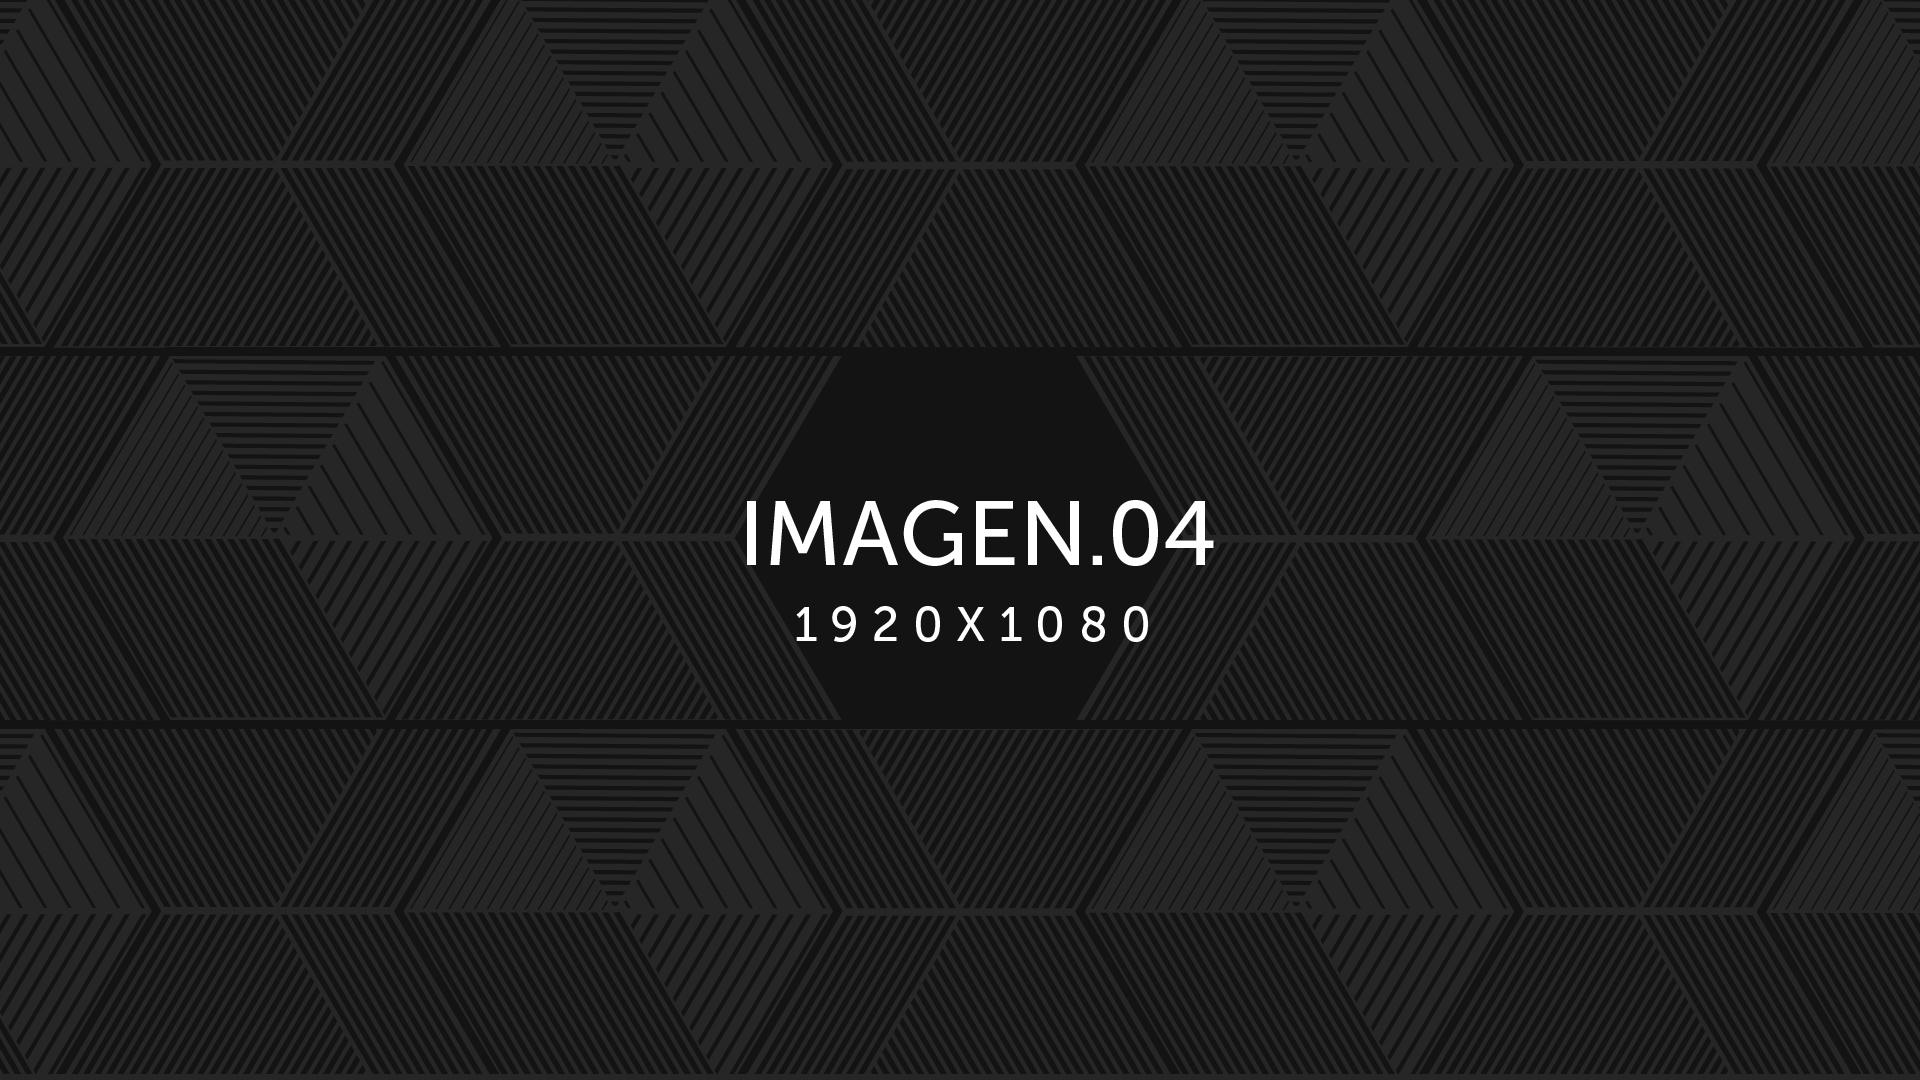 PB_Imagen04_1920x1080.jpg